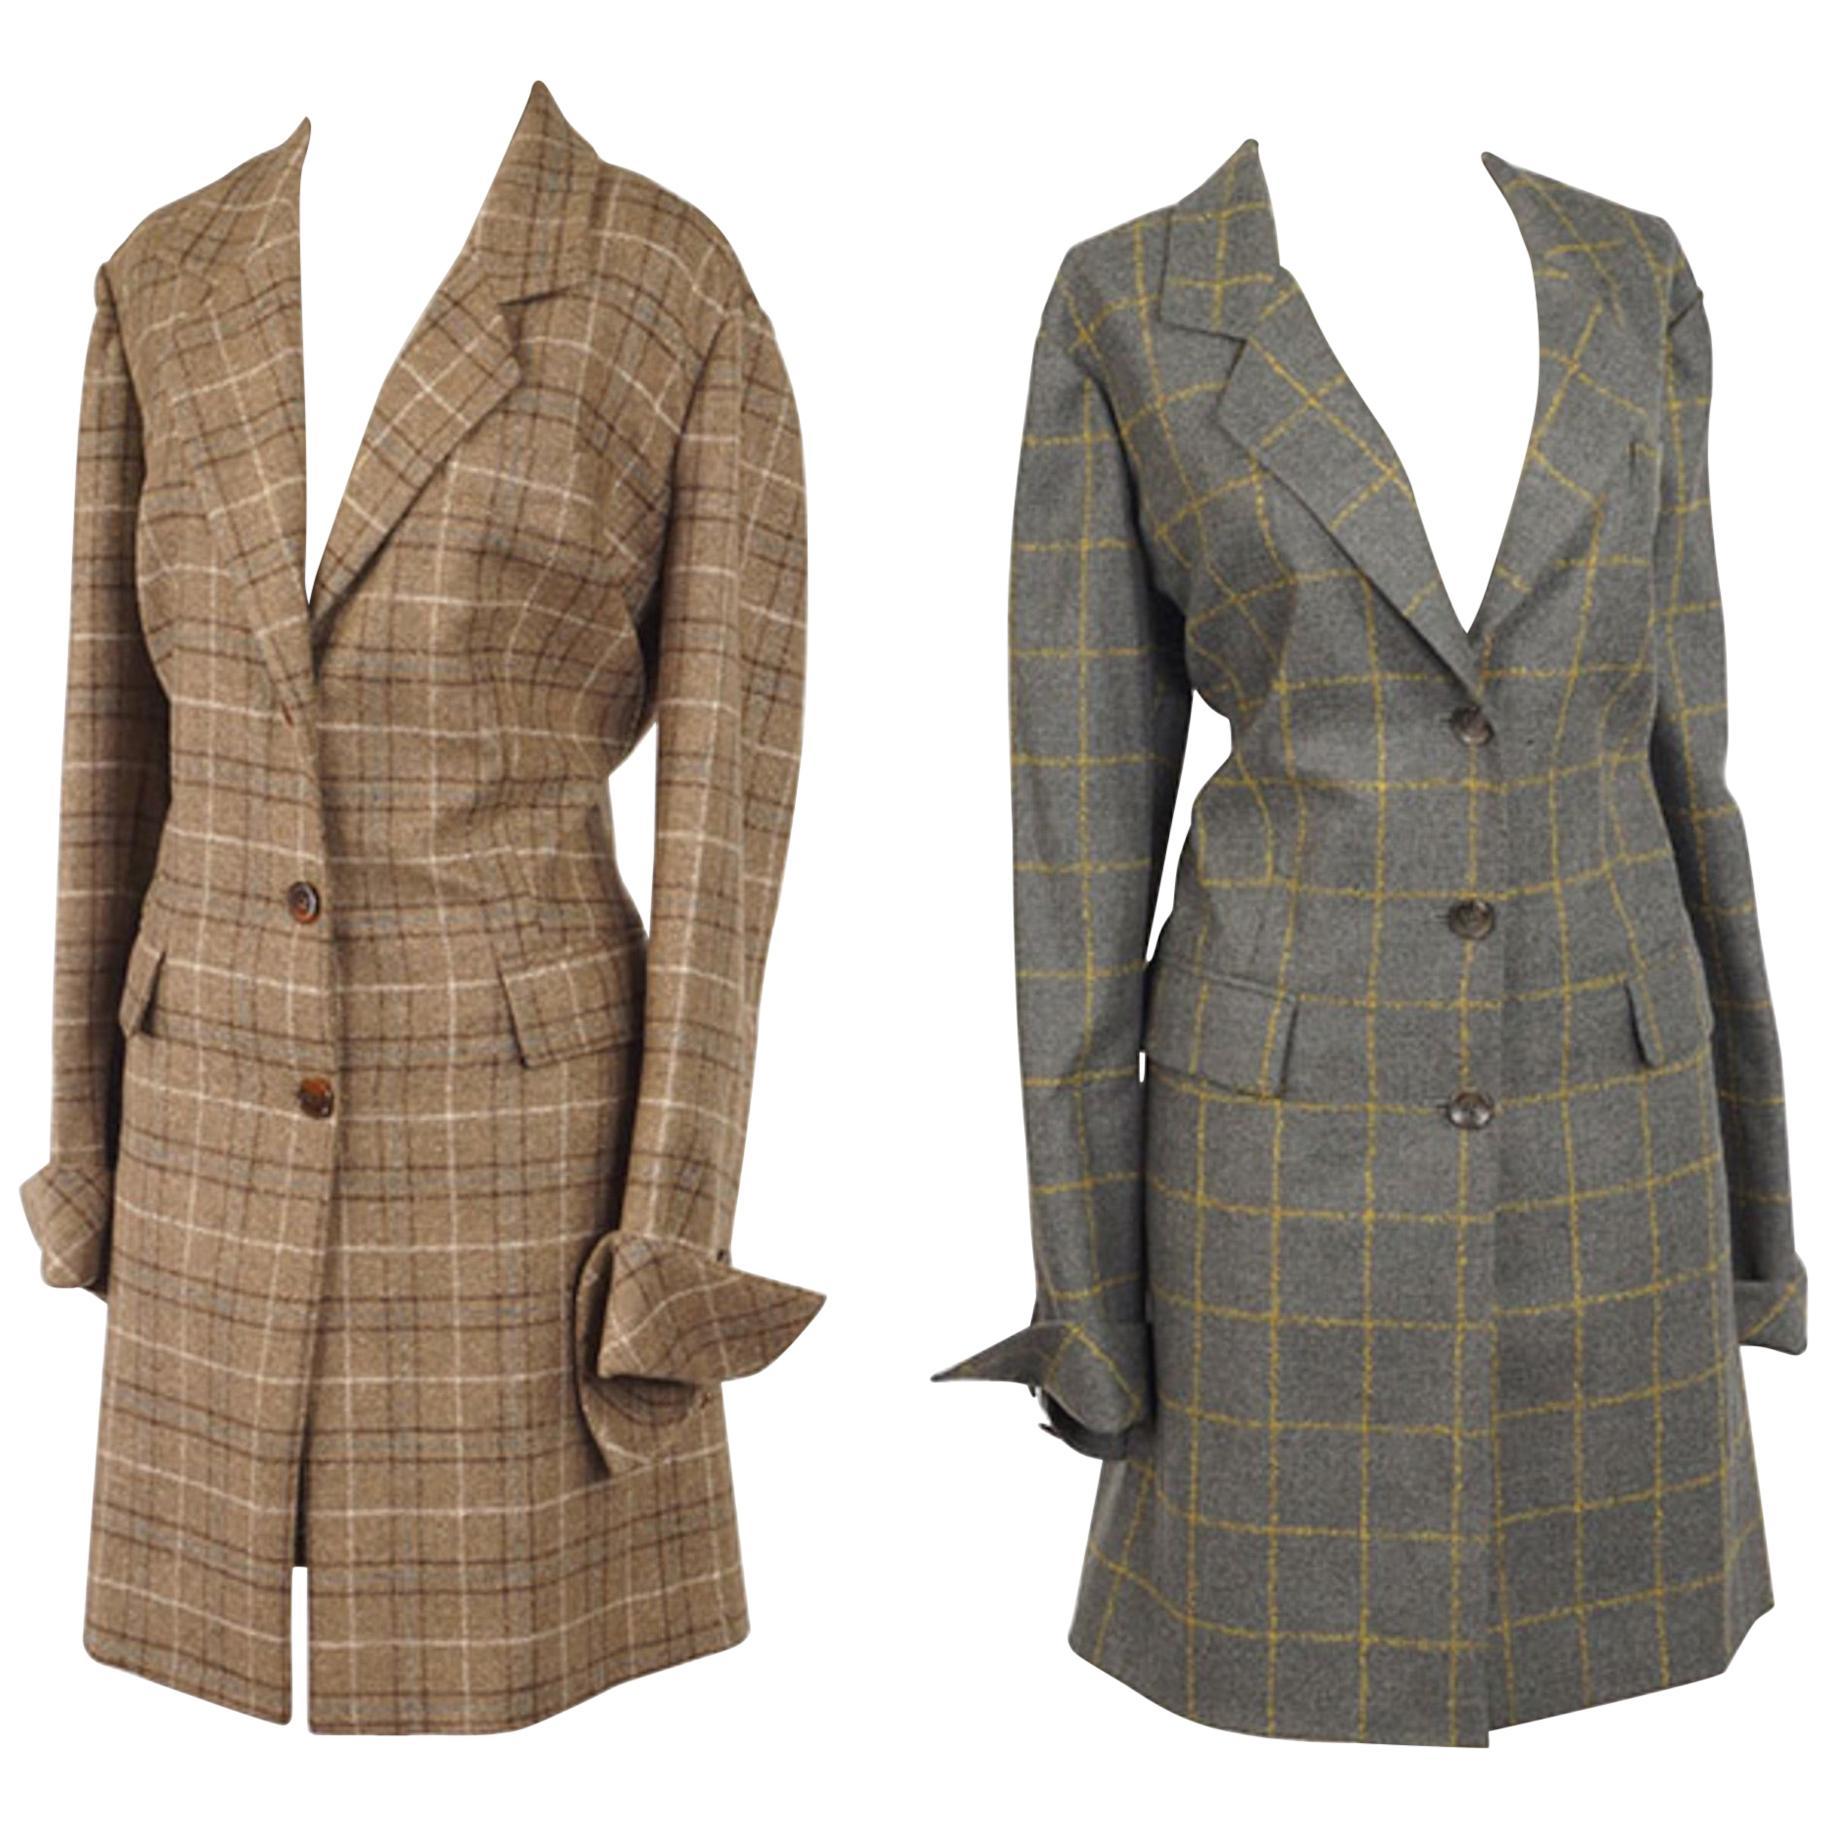 Two Sam Kori George Courture Atelier Cashmere Coats. Appox Size 12-14